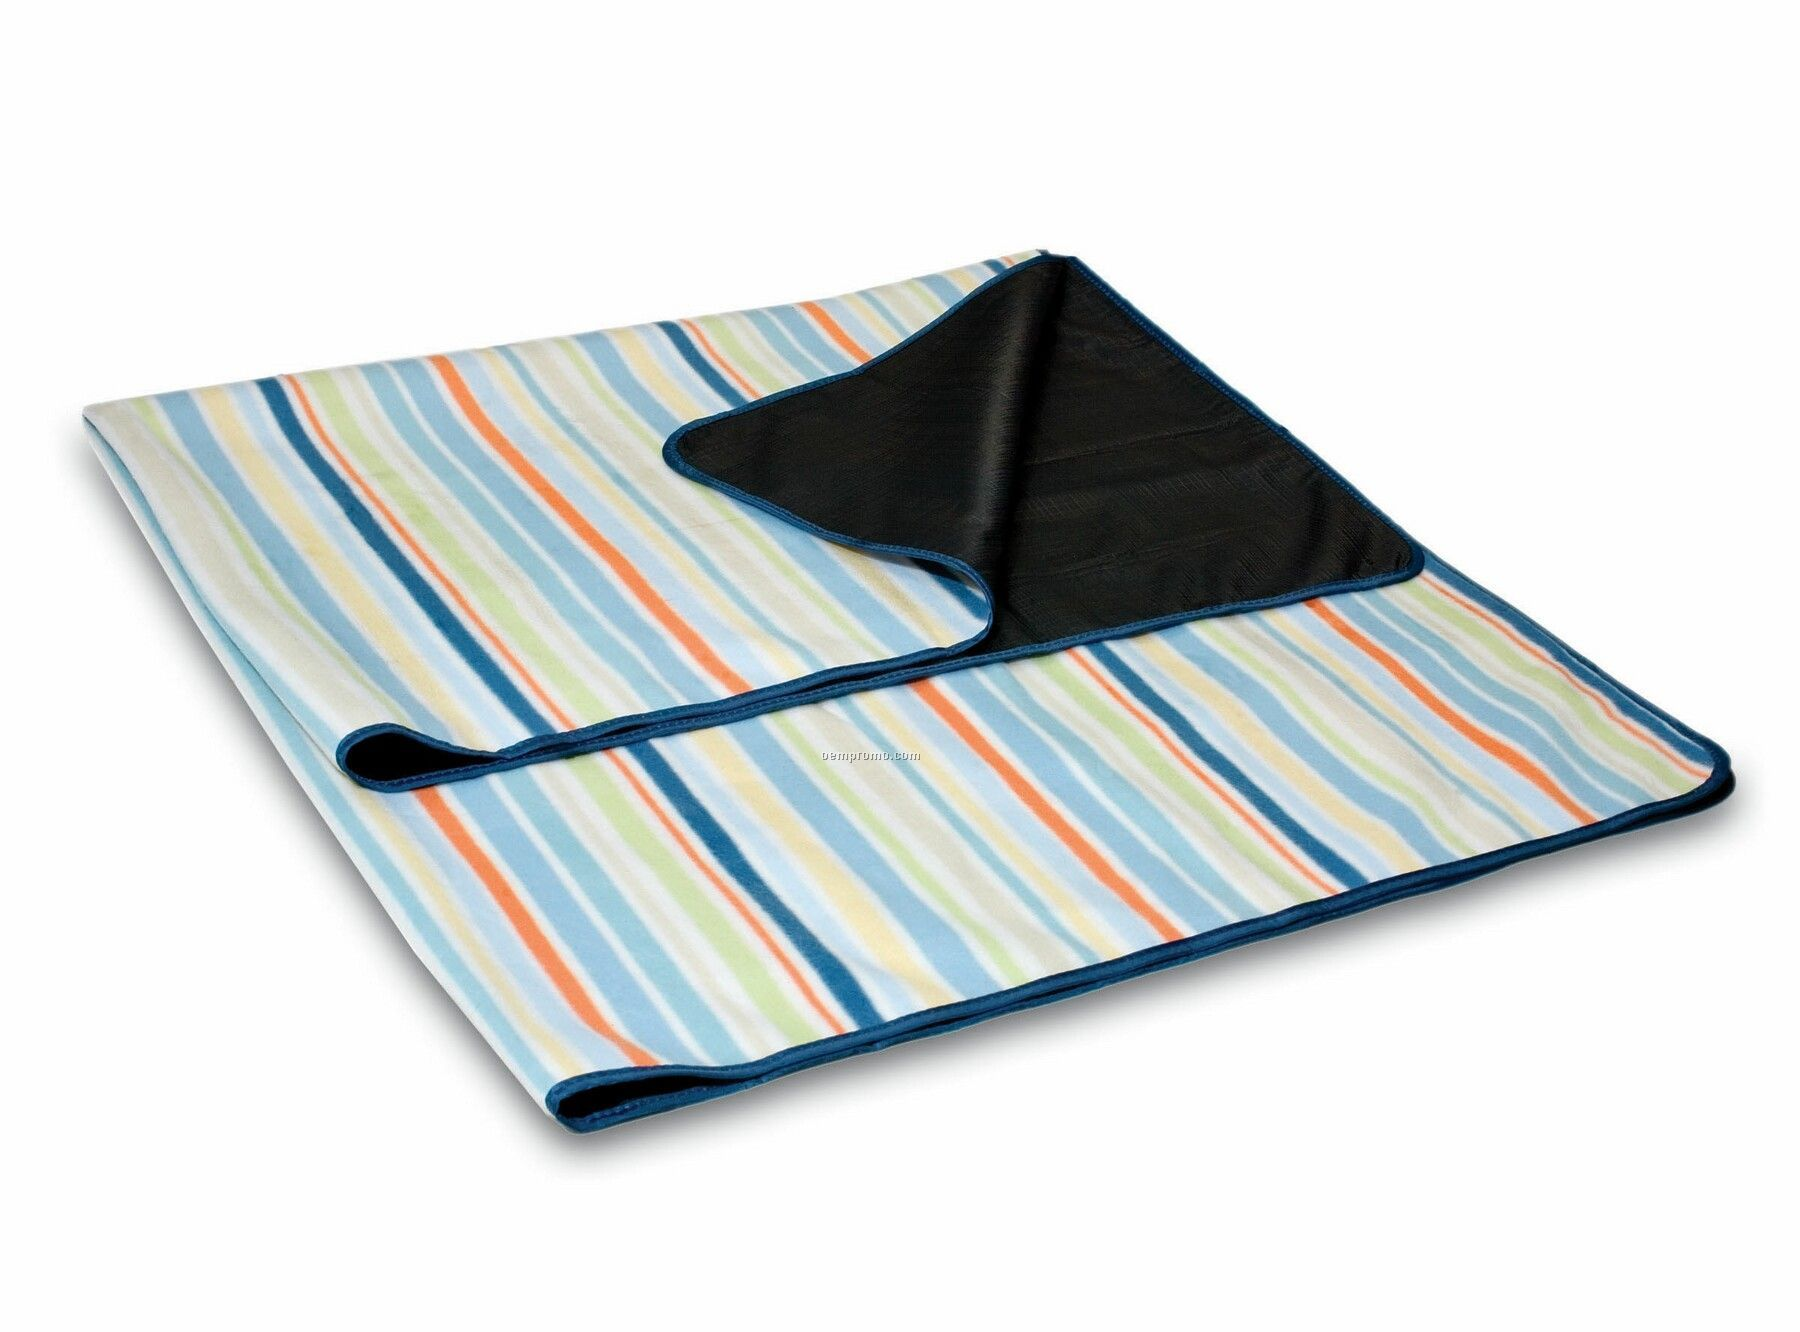 St. Tropez Aqua Striped Blanket Tote